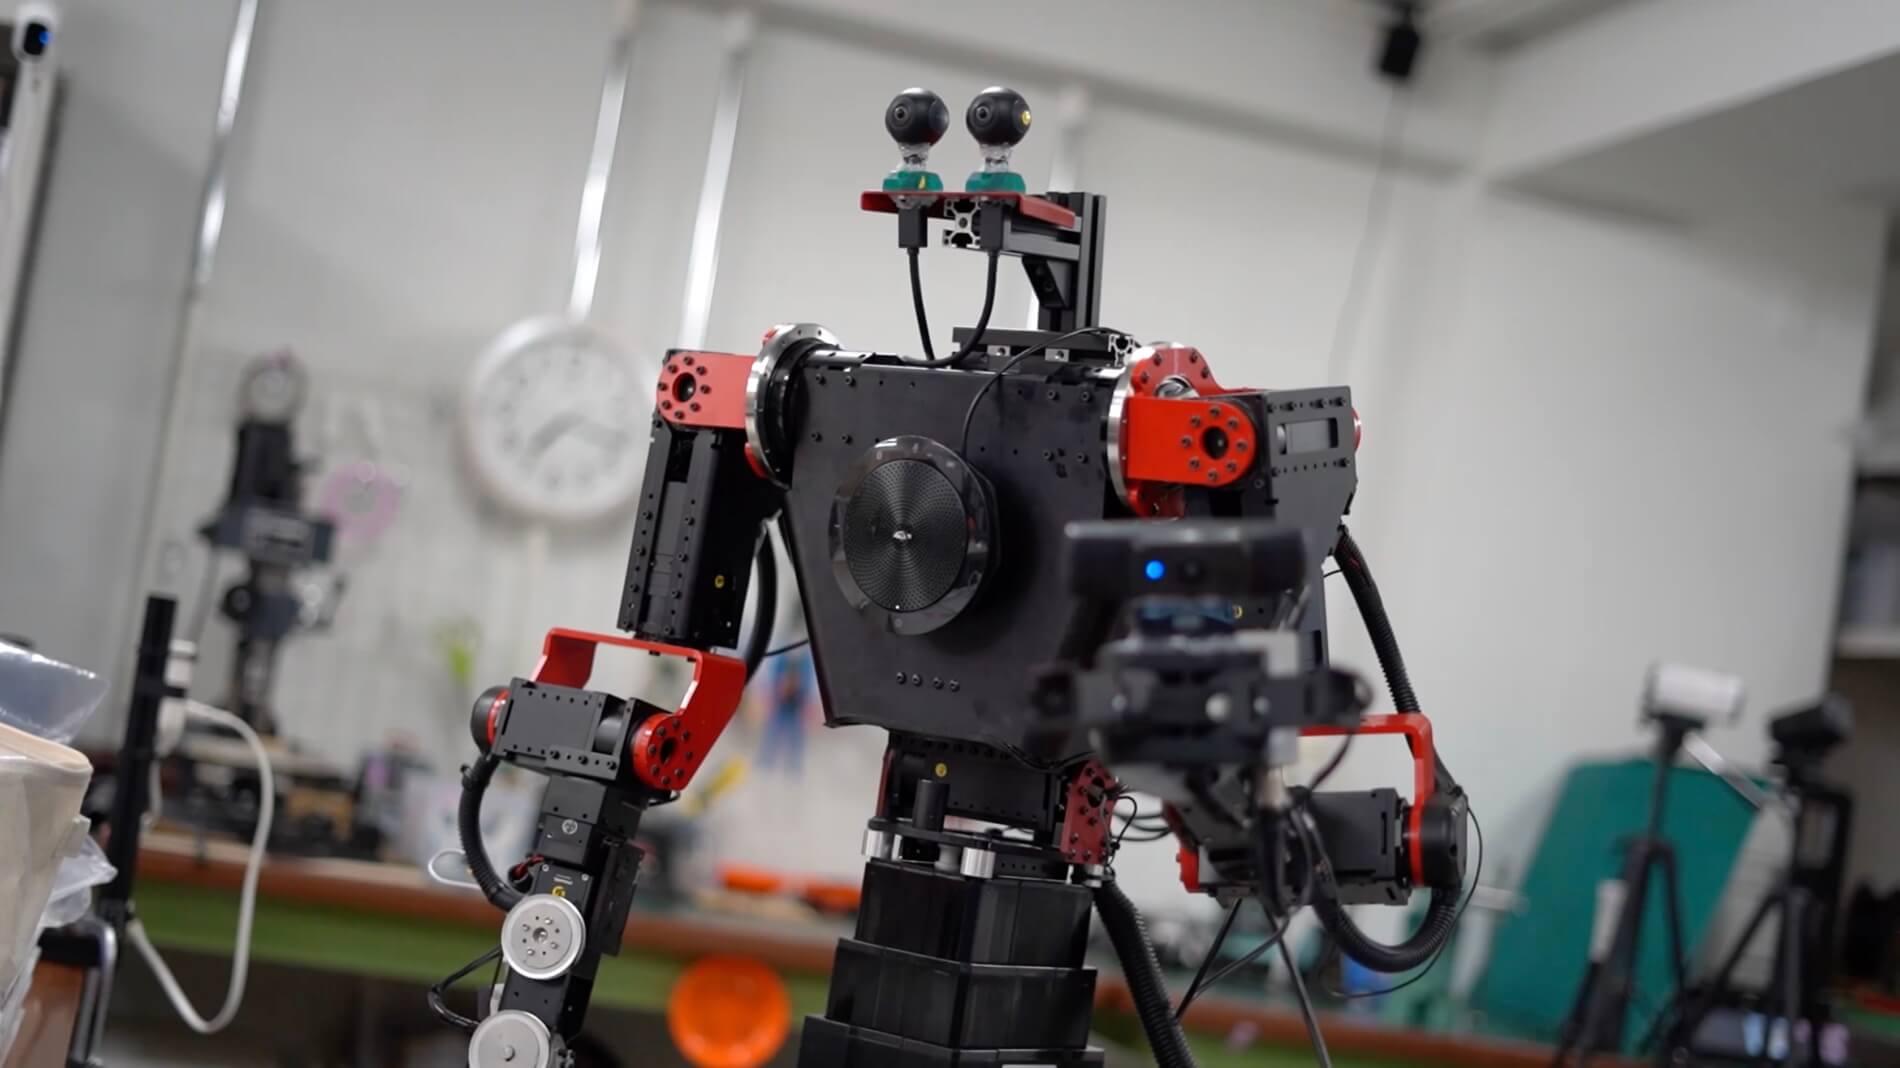 gitairobot